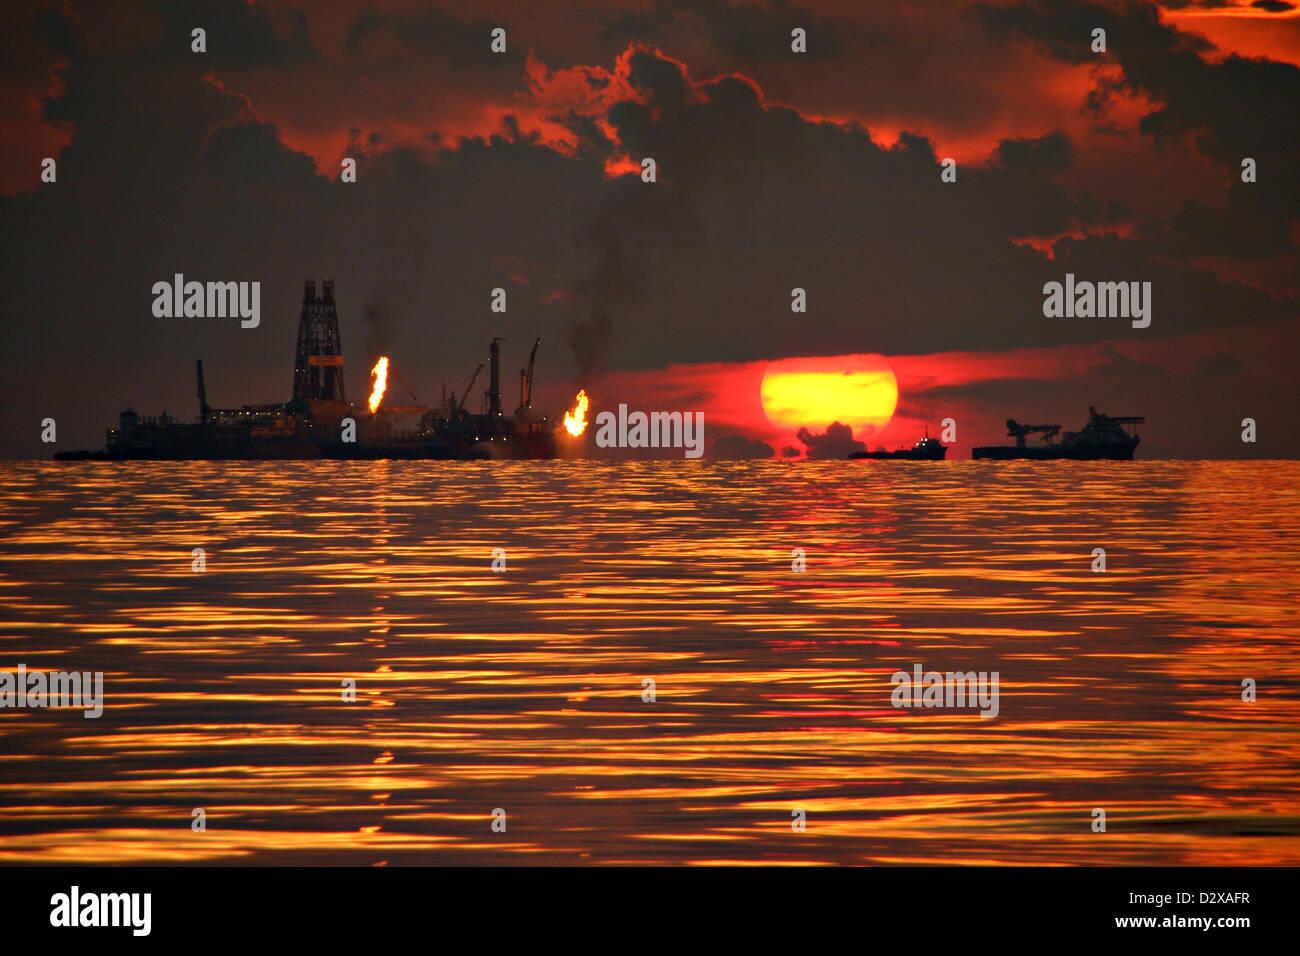 Burning Gas Off Oil Stockfotos & Burning Gas Off Oil Bilder - Alamy